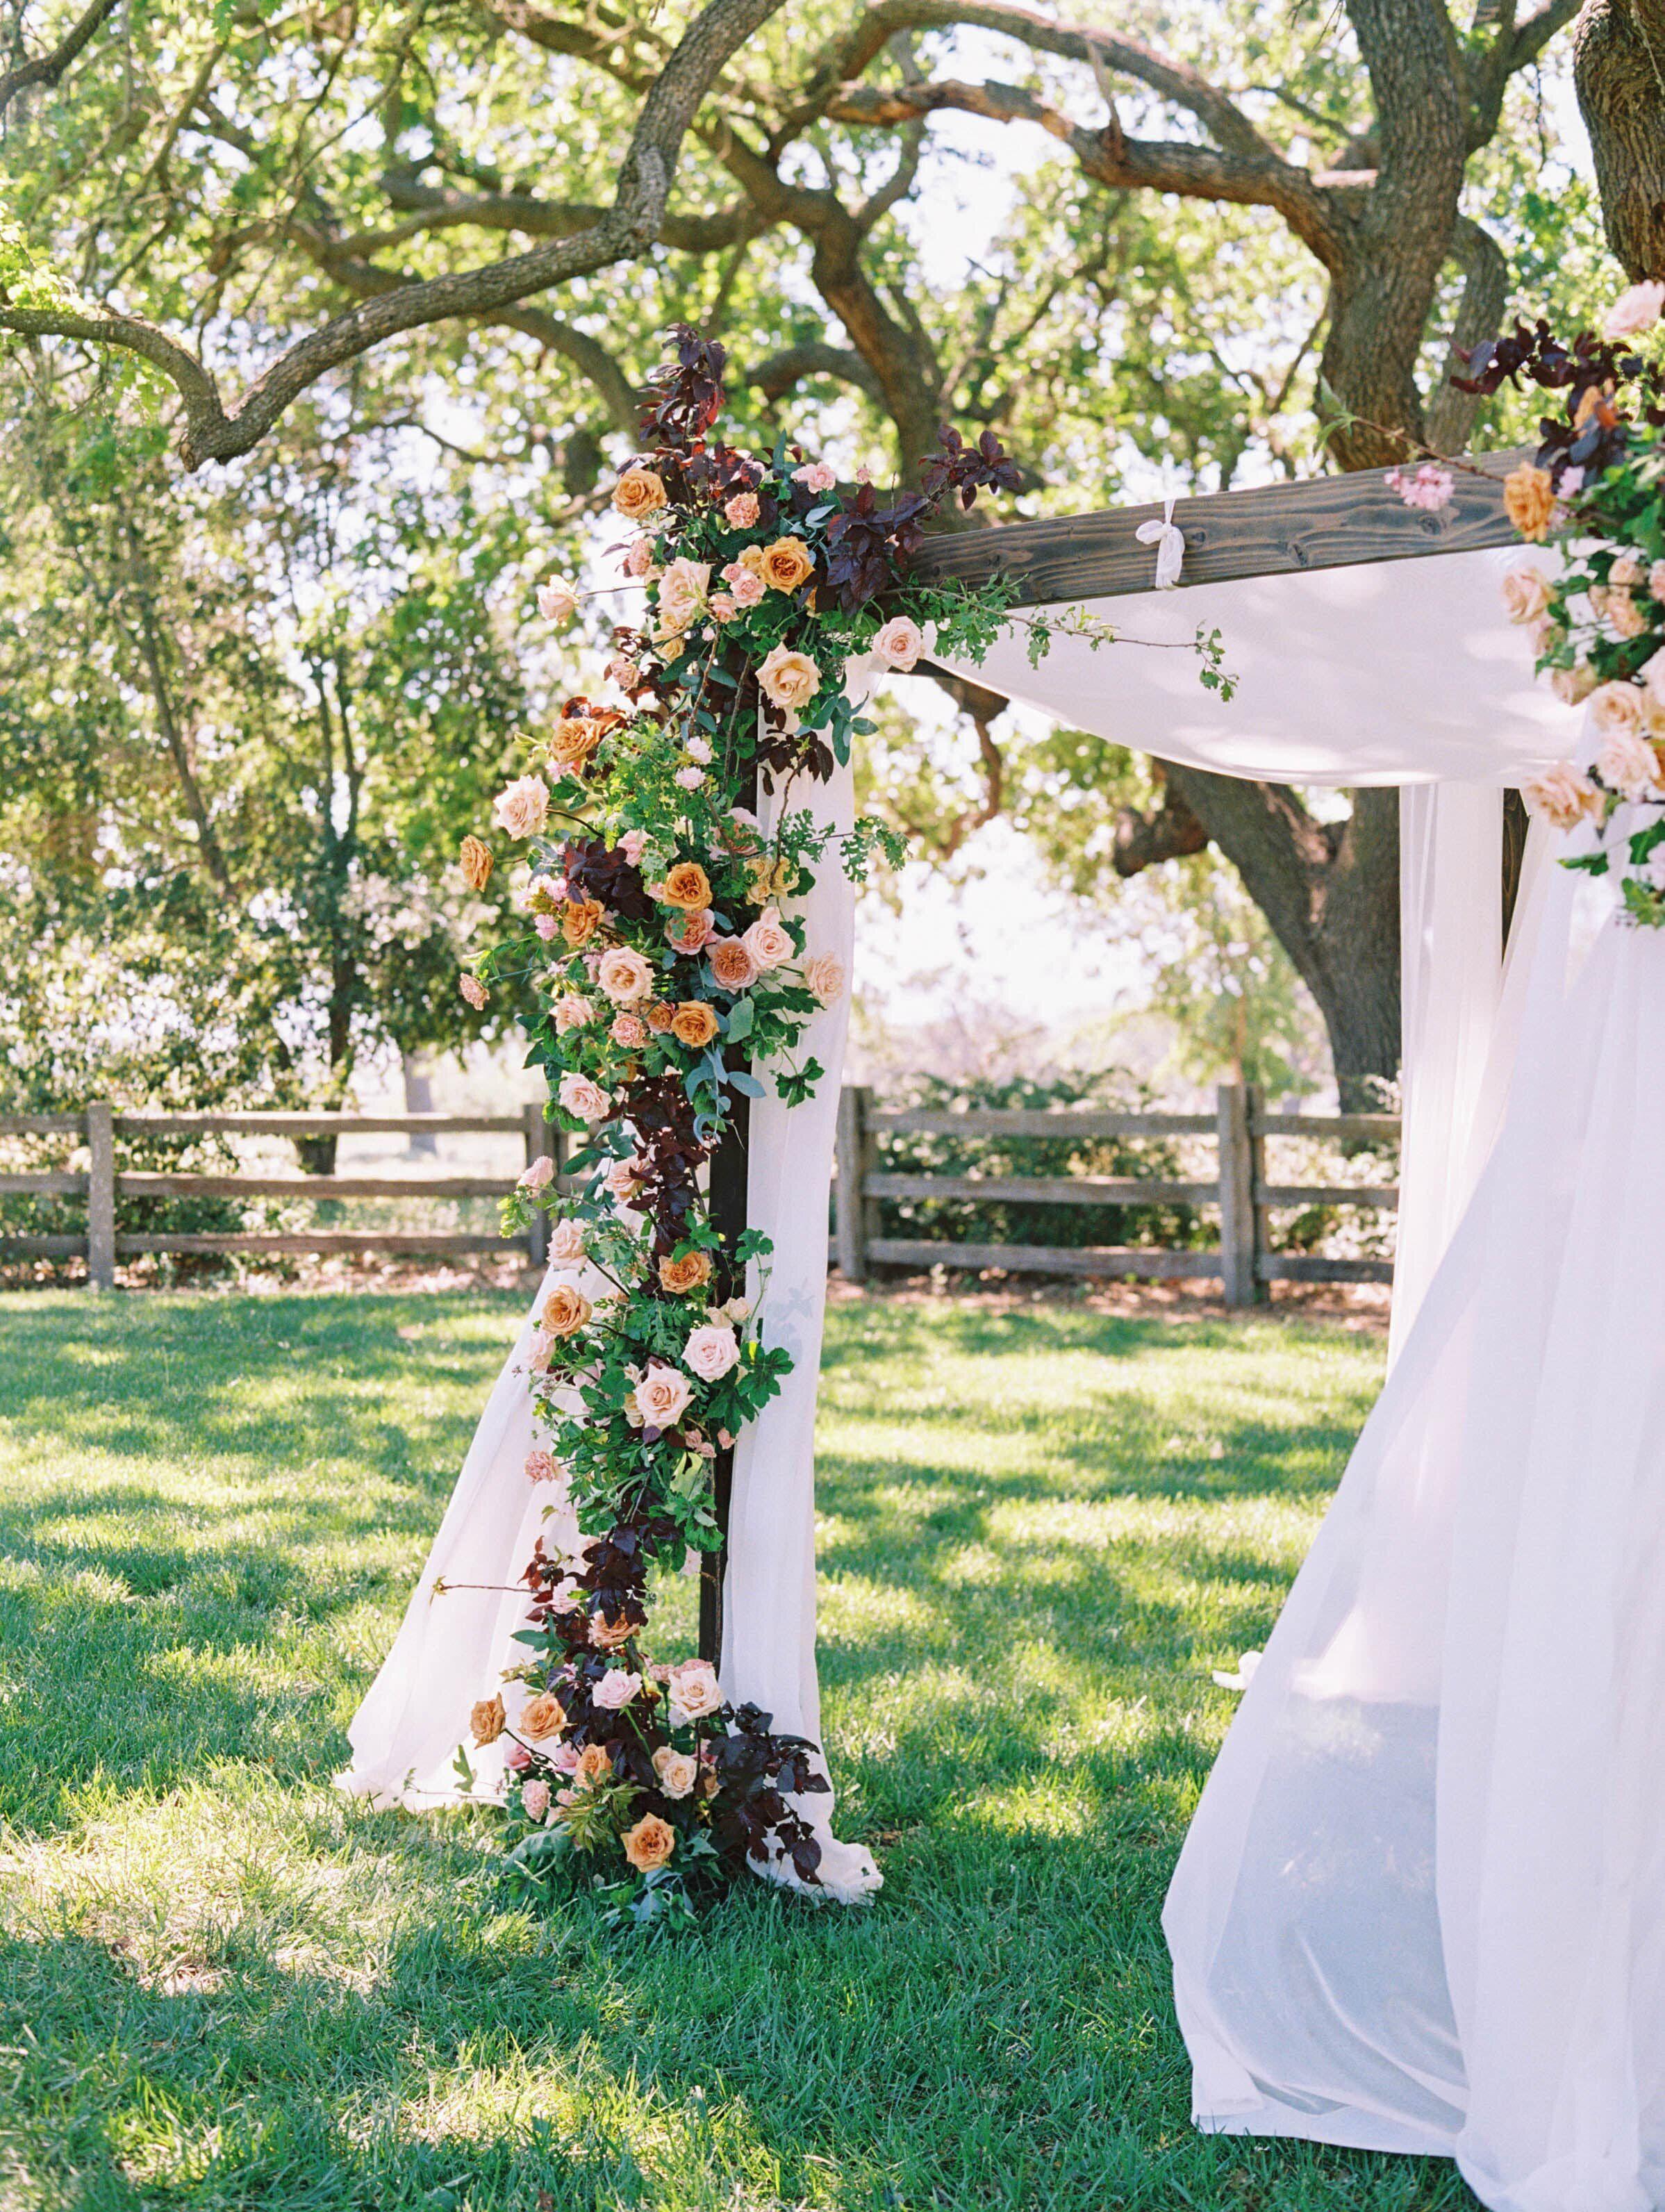 California Destination Wedding Planner Haroun Events In 2020 Coastal Wedding Inspiration Wedding Southern California Destination Wedding Inspiration